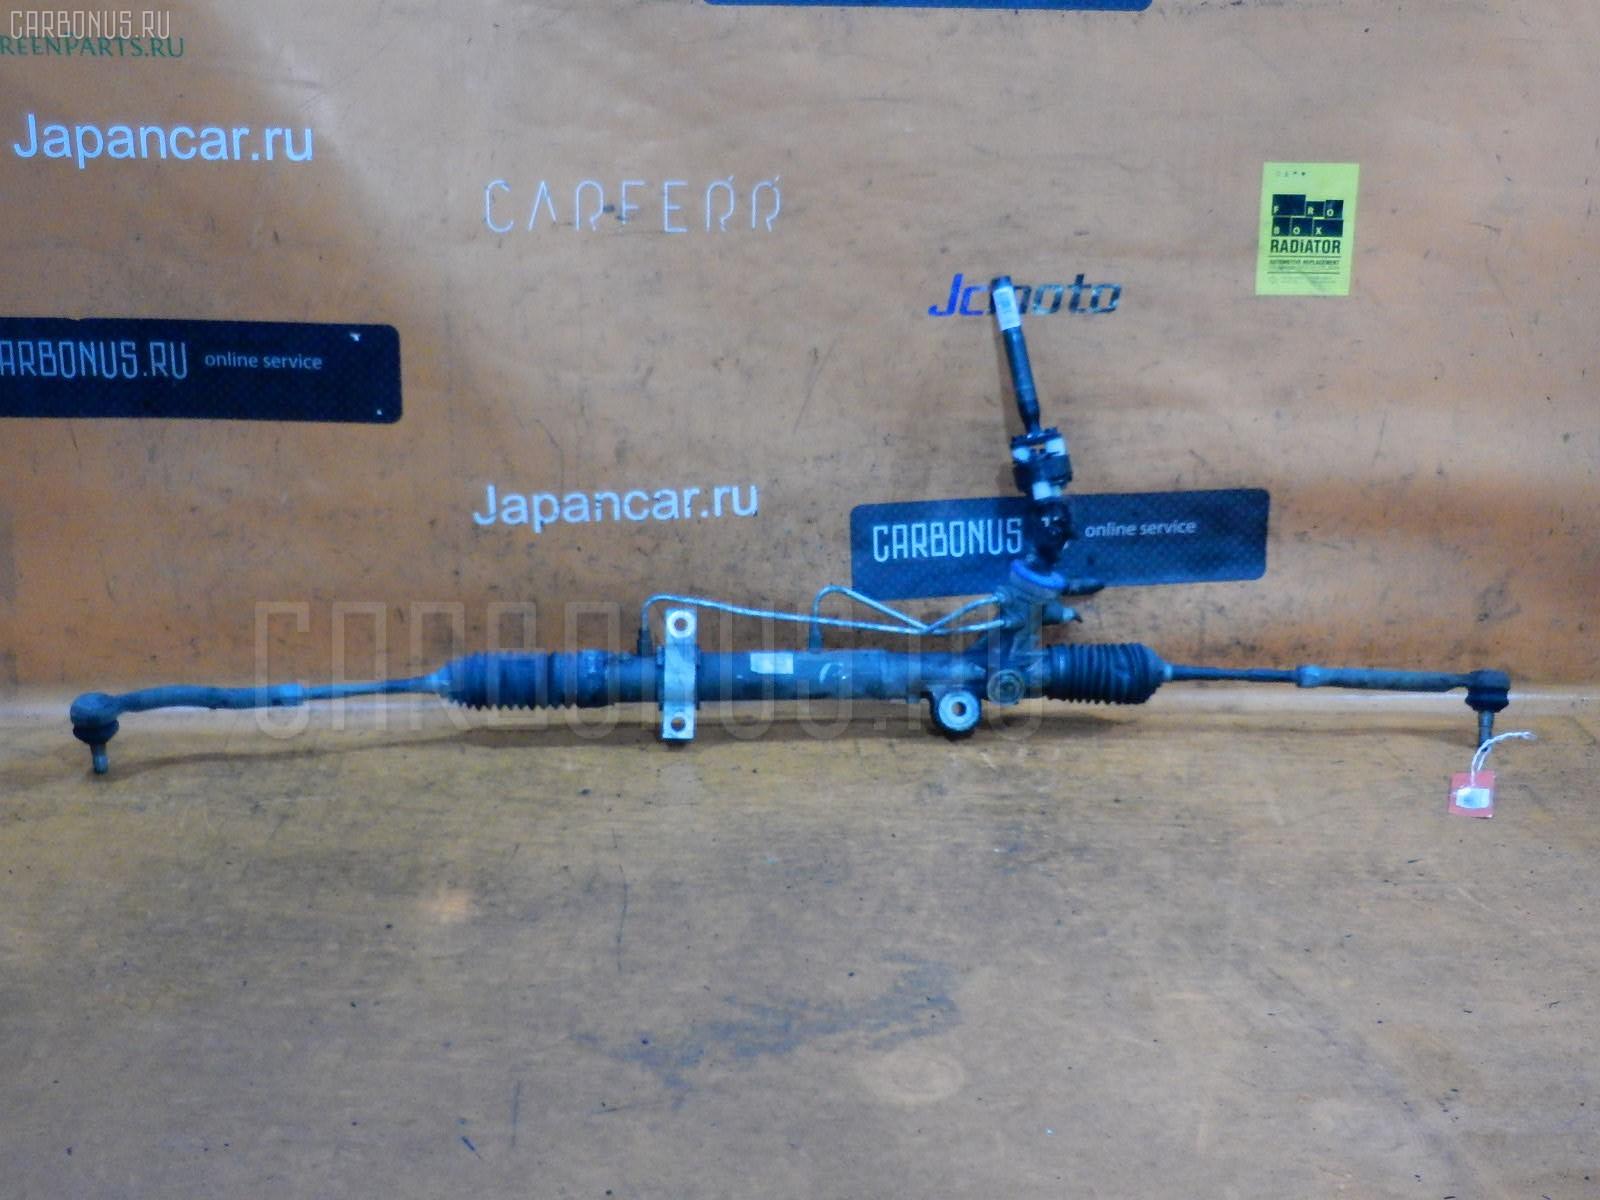 Ремонт рулевой рейки ниссан теана j32 своими руками 59